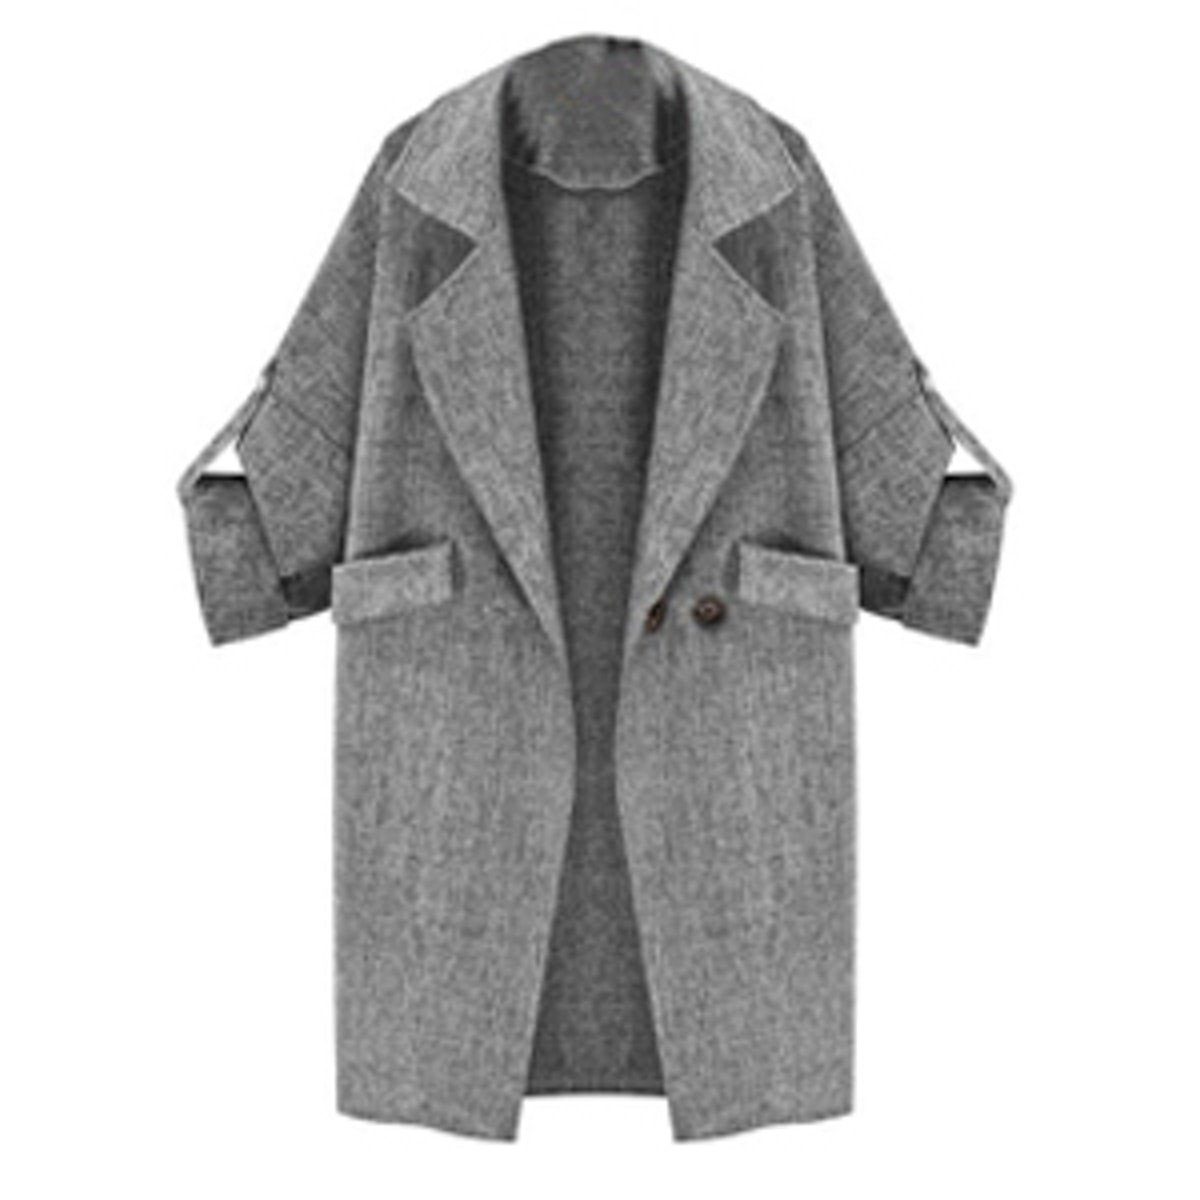 Lapel Collar Adjustable Sleeve Trench Coat